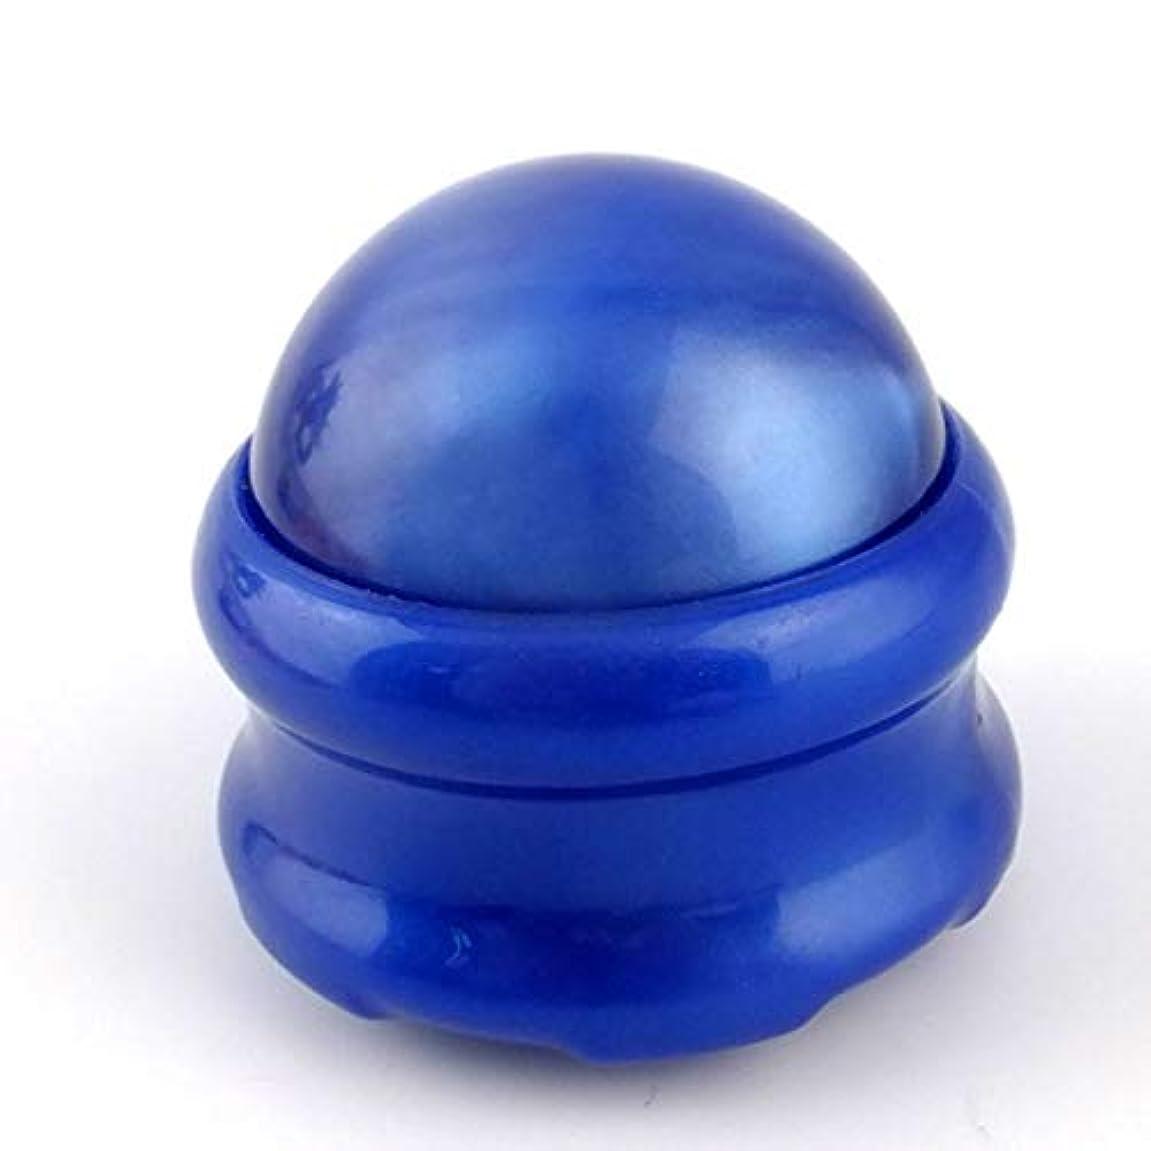 HAMILO マッサージボール 健康器具 ローラー 肩 腰 足裏 首すじ コロコロ マッサージ (2個セット)